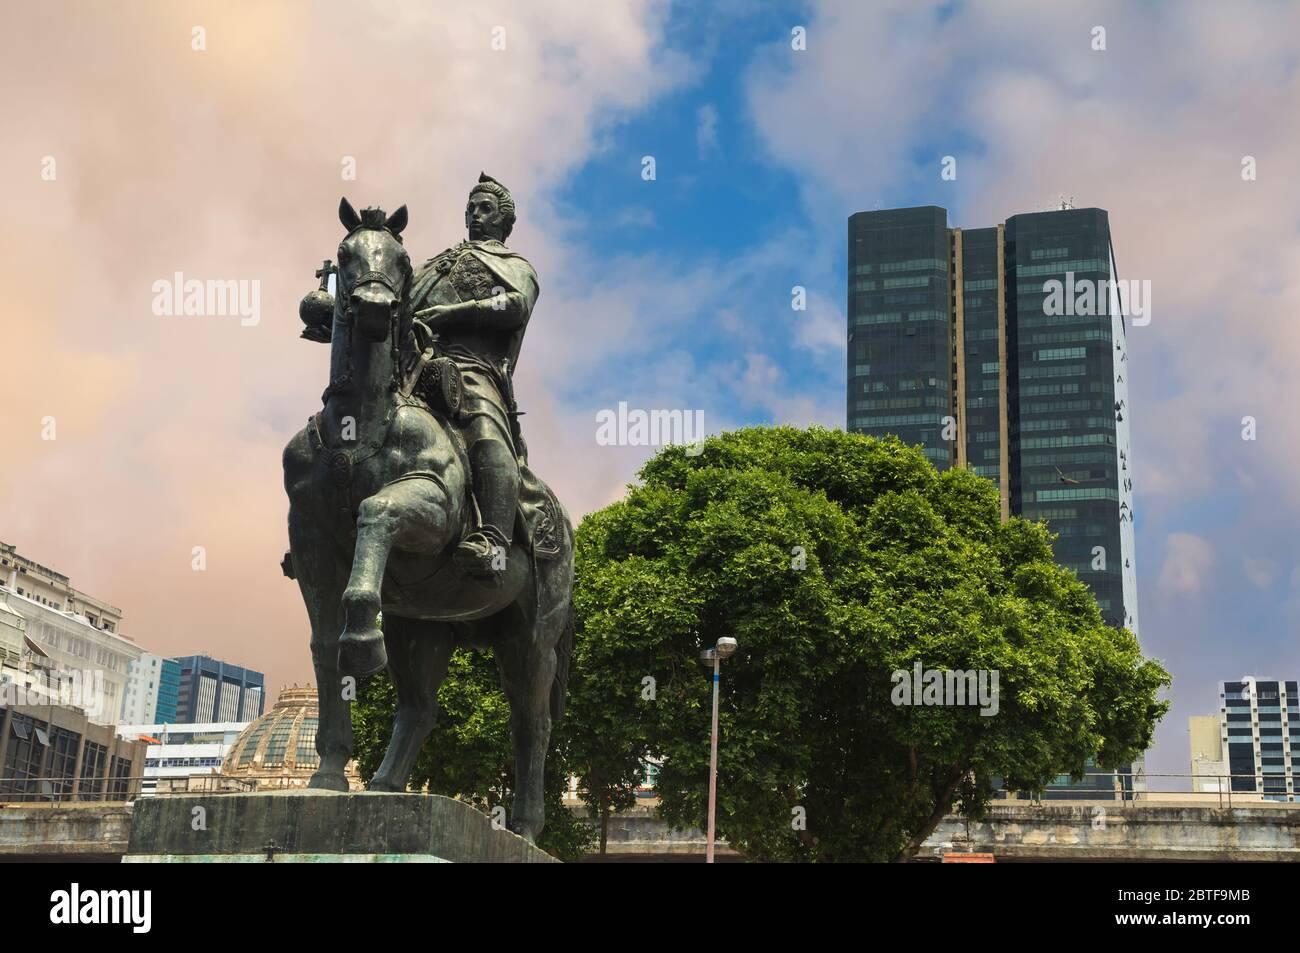 Dom Joao VI Statue, Praça XV, Rio de Janeiro, Brazil Stock Photo